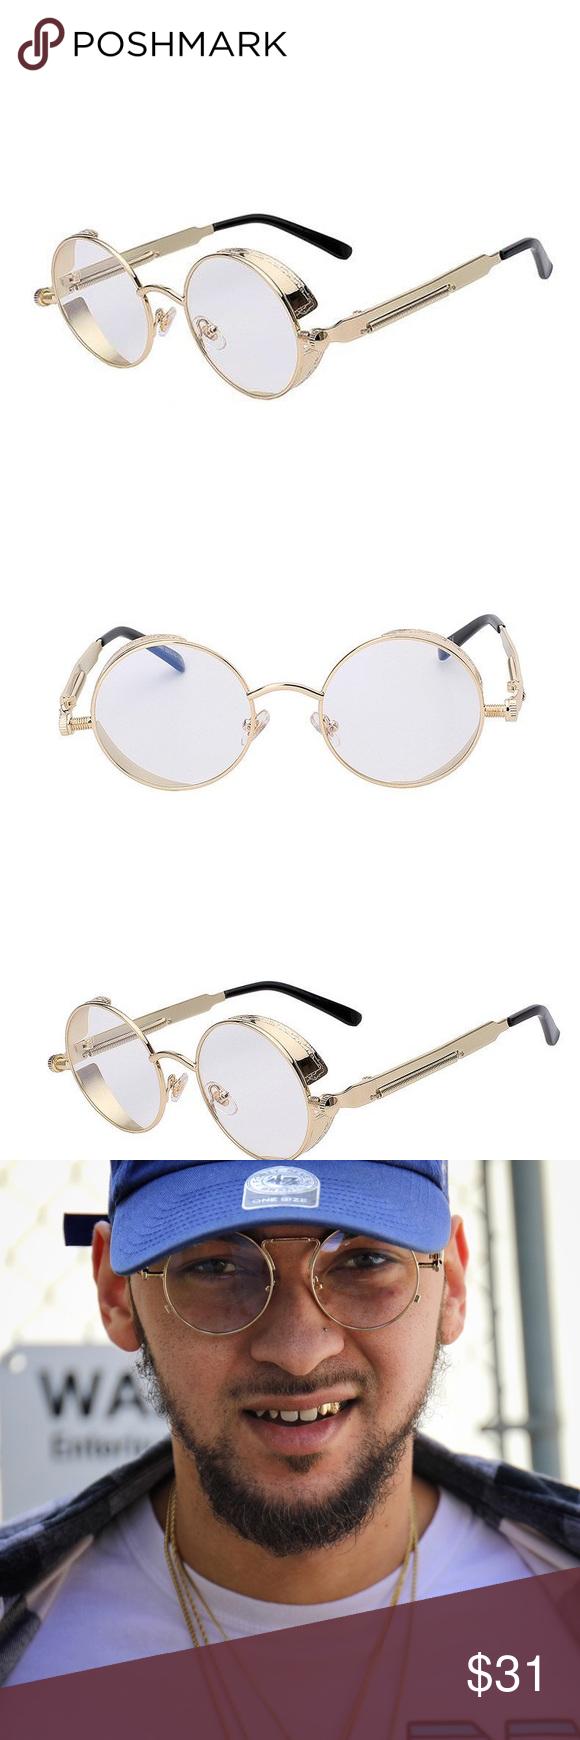 c85cfe1aeb88 Round Gold OG Frame Mens Clear Eye Glasses Round Gold Frame Mens Clear Eye Glasses  Frame Material  Alloy Lens Width  50mm Lens Height  50mm Lens Material  ...